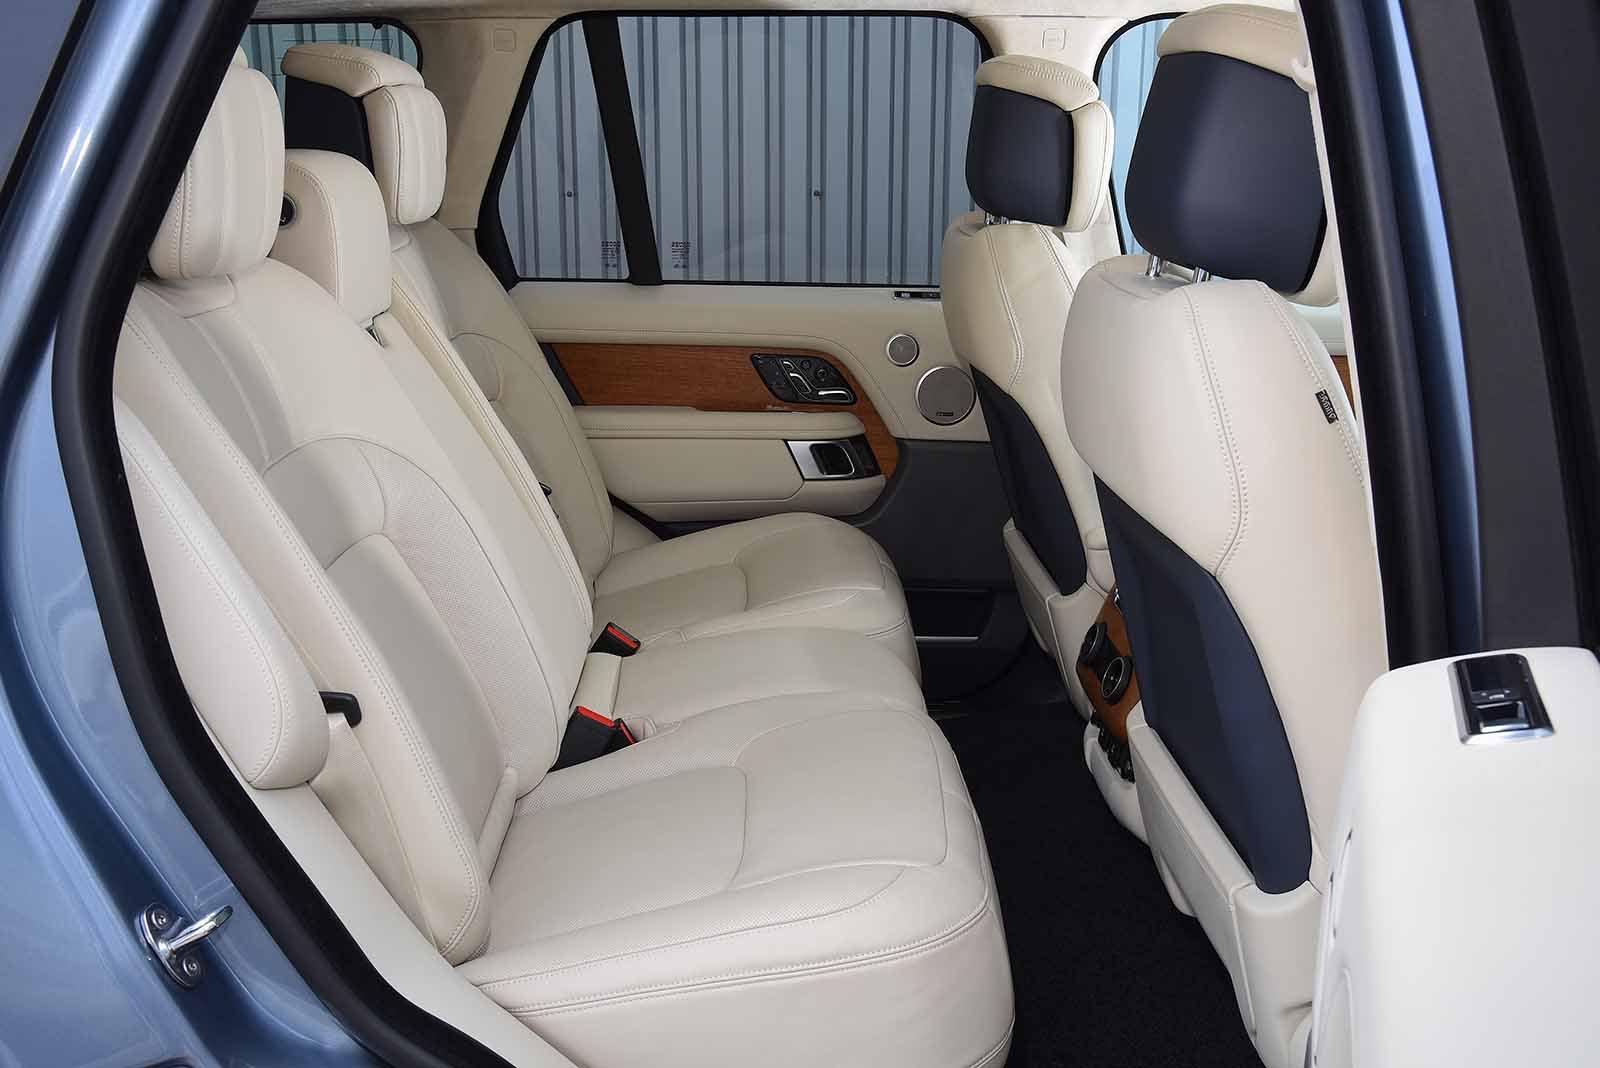 Land Rover Range Rover 2018 rear seats RHD